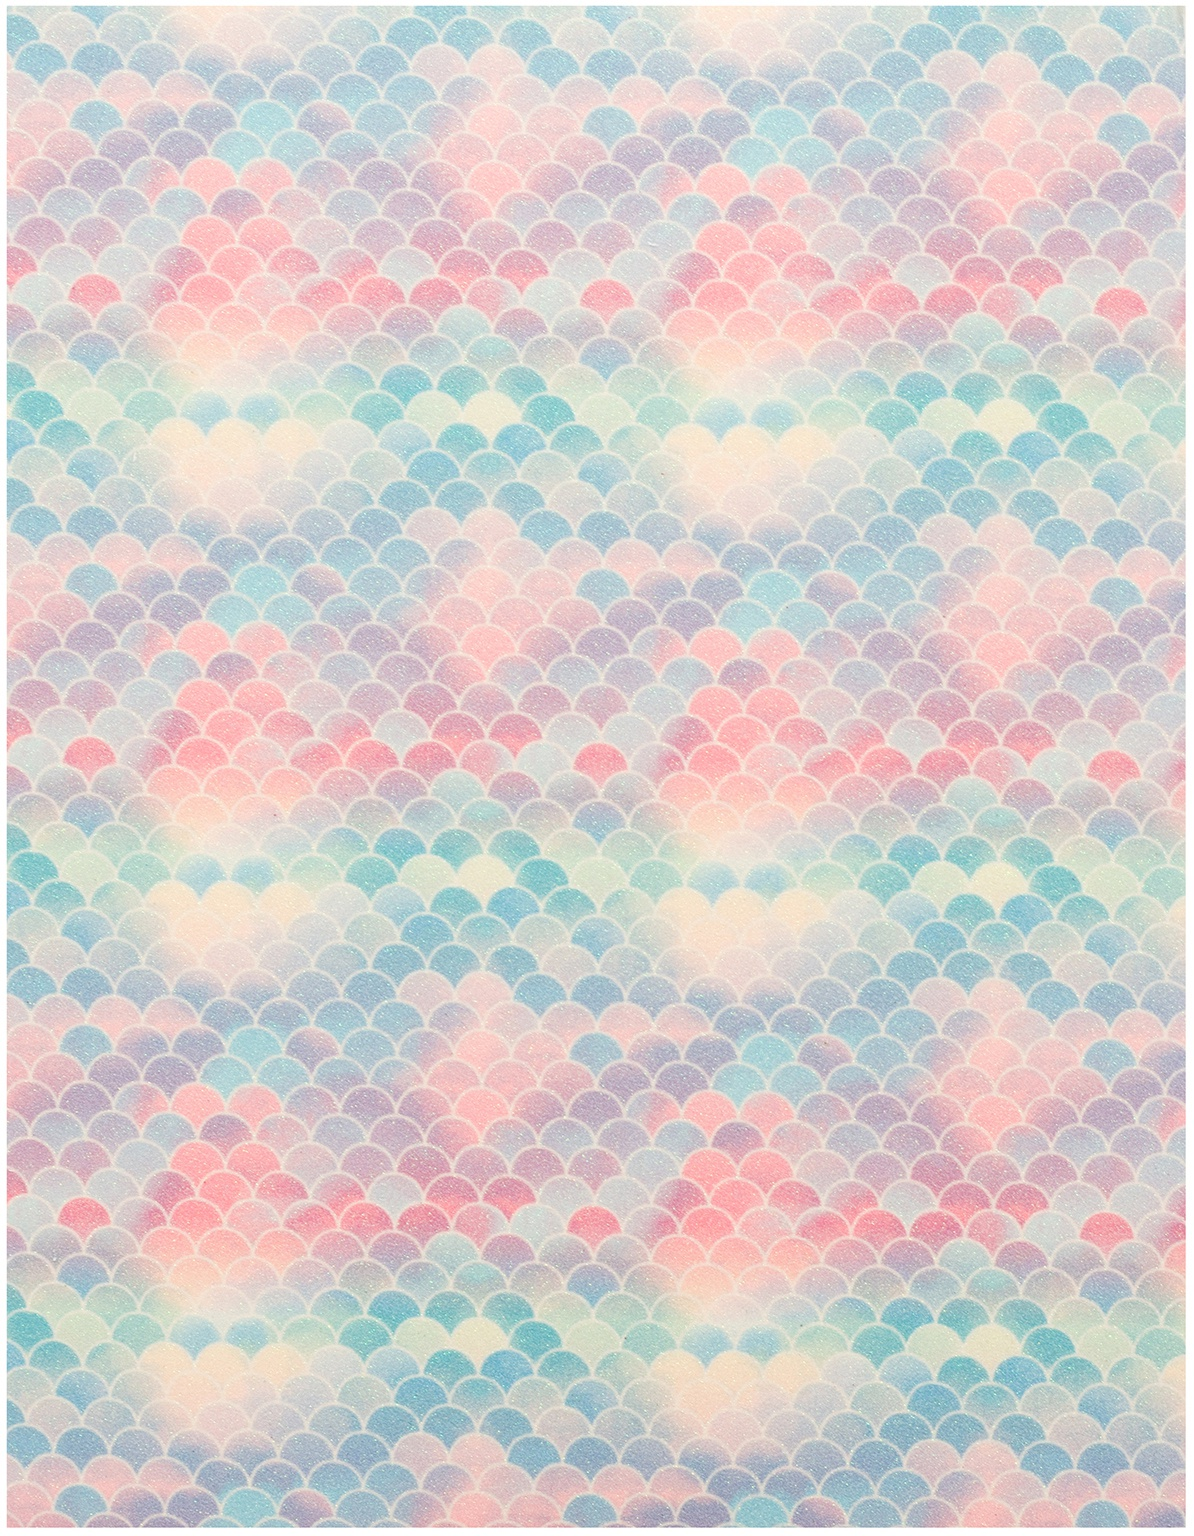 American Crafts Glitter Specialty Paper 8.5X11-Lip Gloss Mermaid